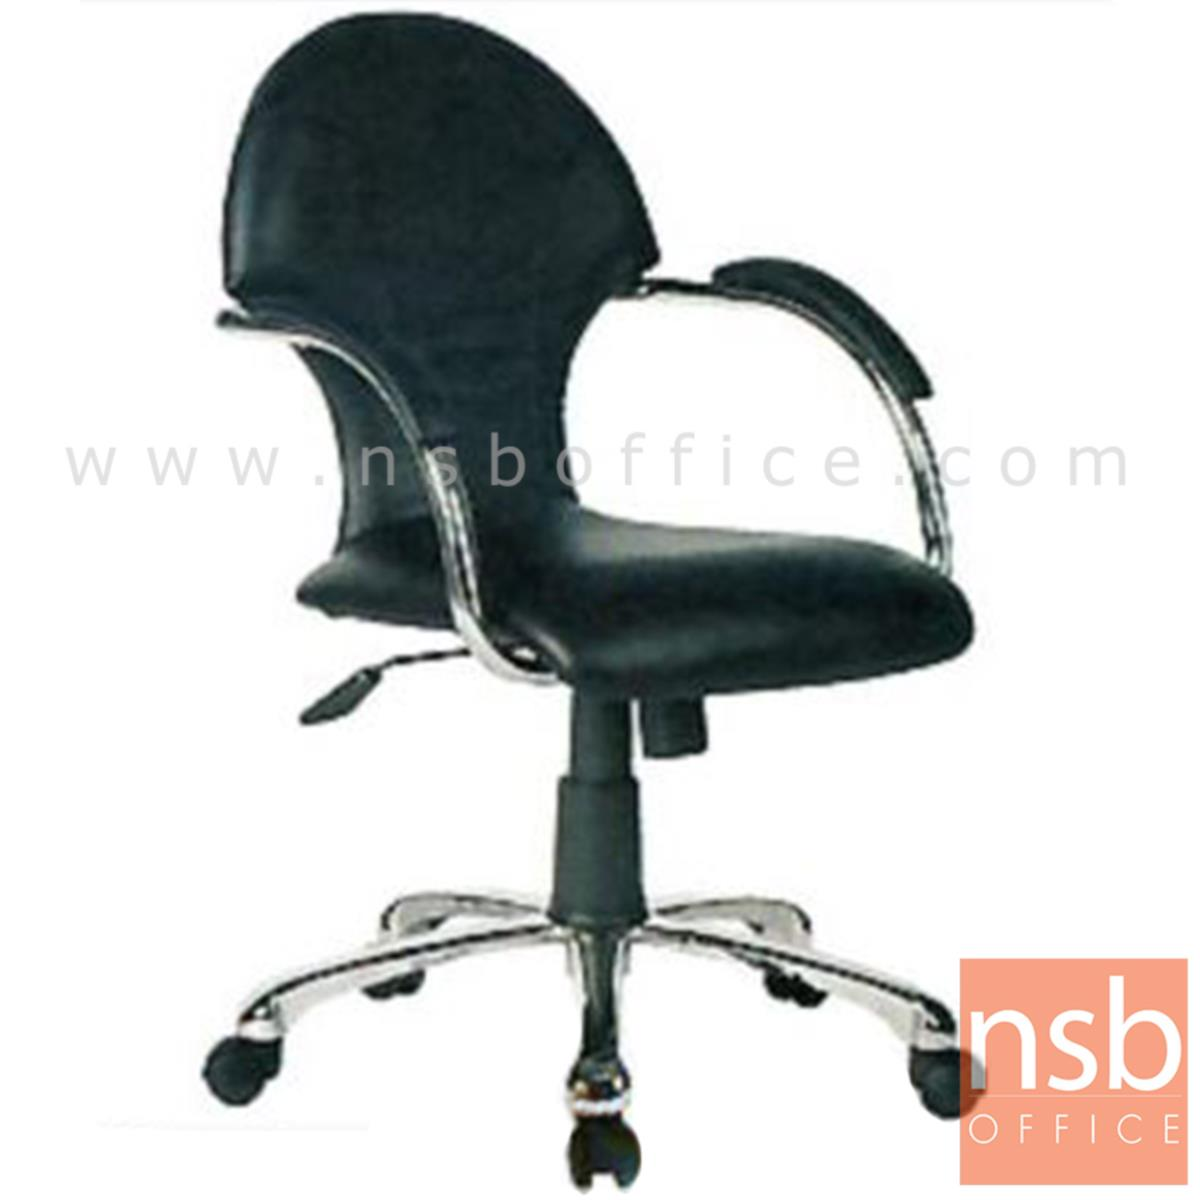 B03A315:เก้าอี้สำนักงาน รุ่น Clay (เคล)  โช๊คแก๊ส มีก้อนโยก ขาเหล็กชุบโครเมี่ยม